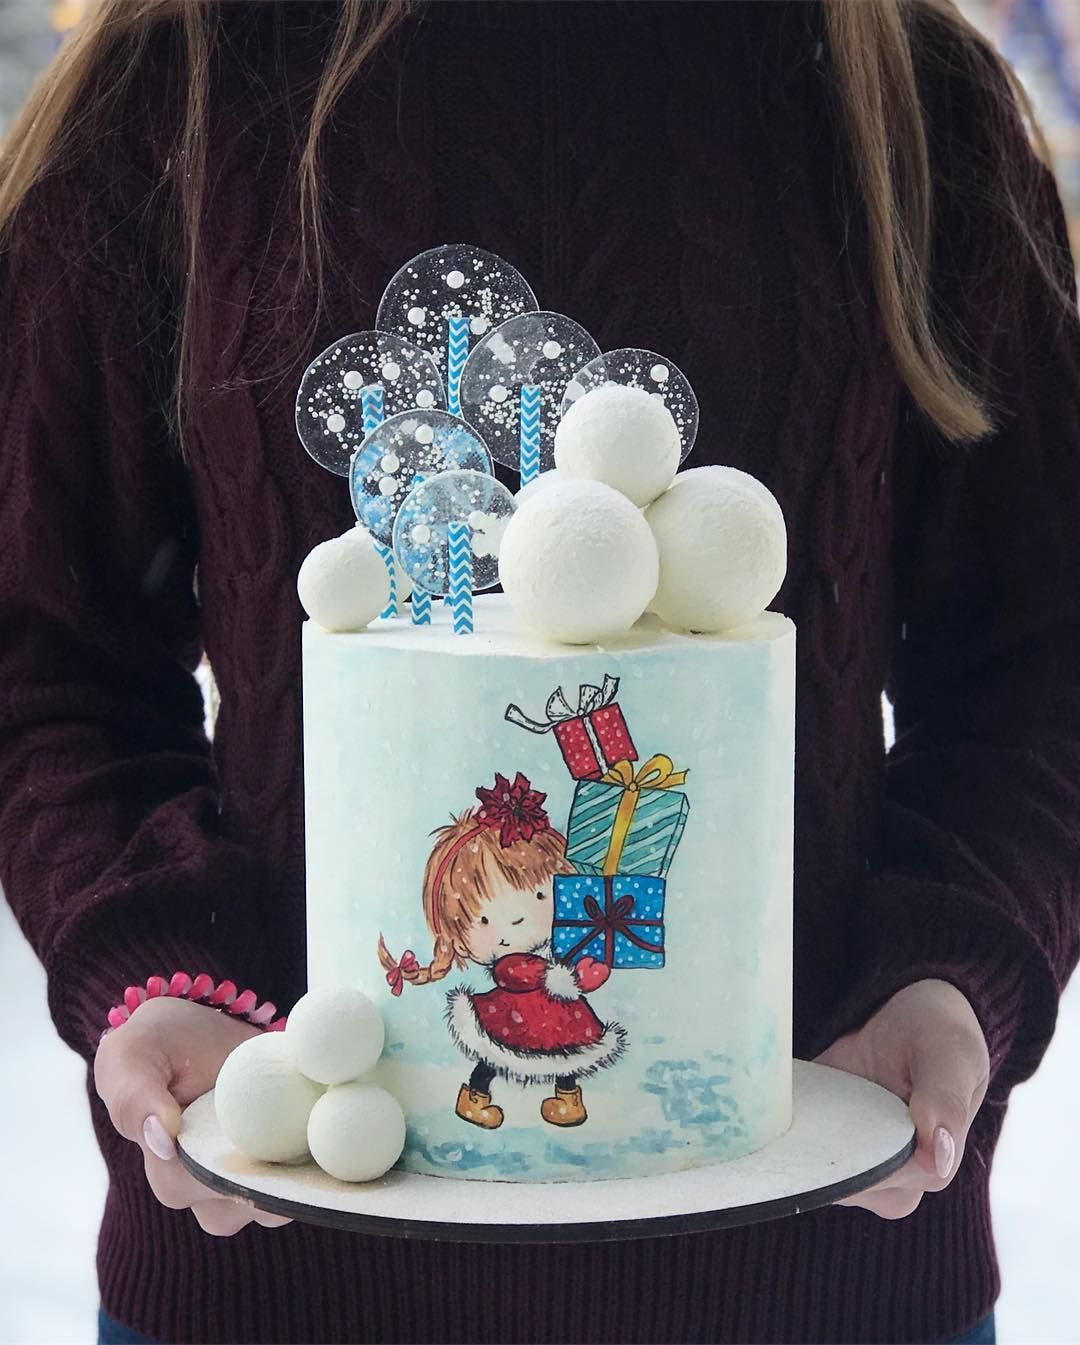 Нет описания фото. | Cake decorating, Cake, Decor